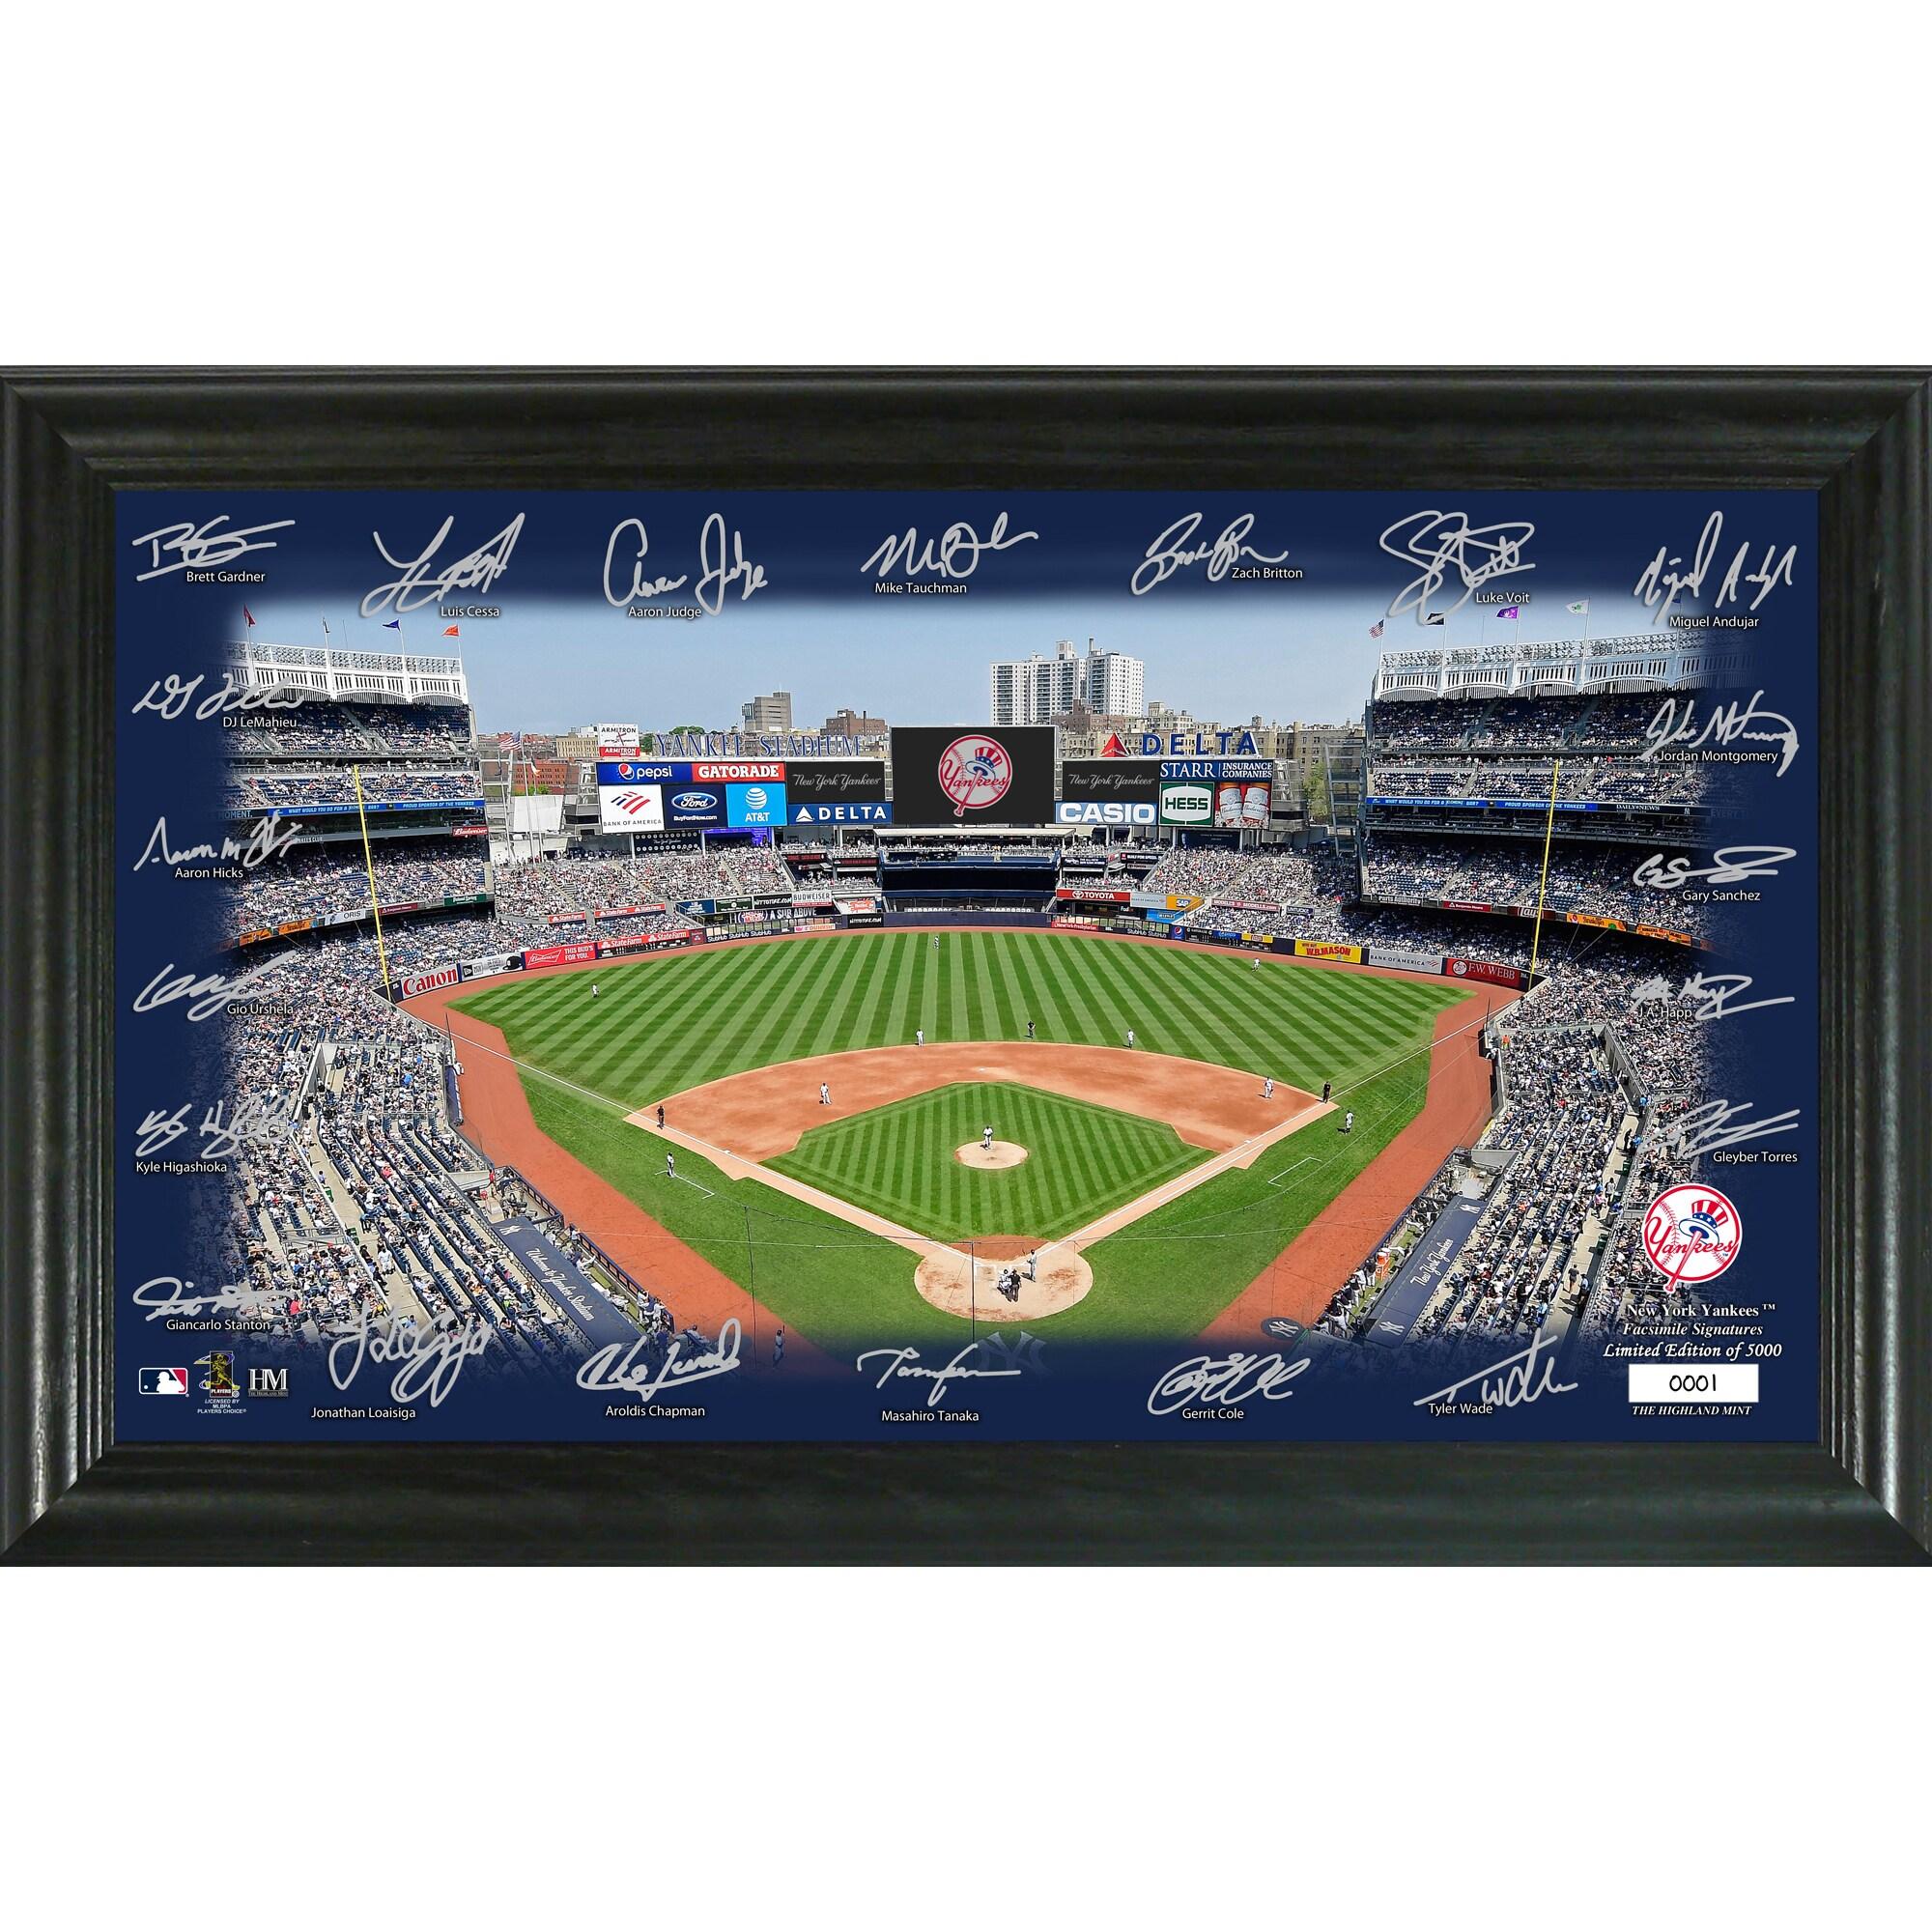 New York Yankees Highland Mint 12'' x 20'' Signature Field Limited Editon Framed Photo Mint